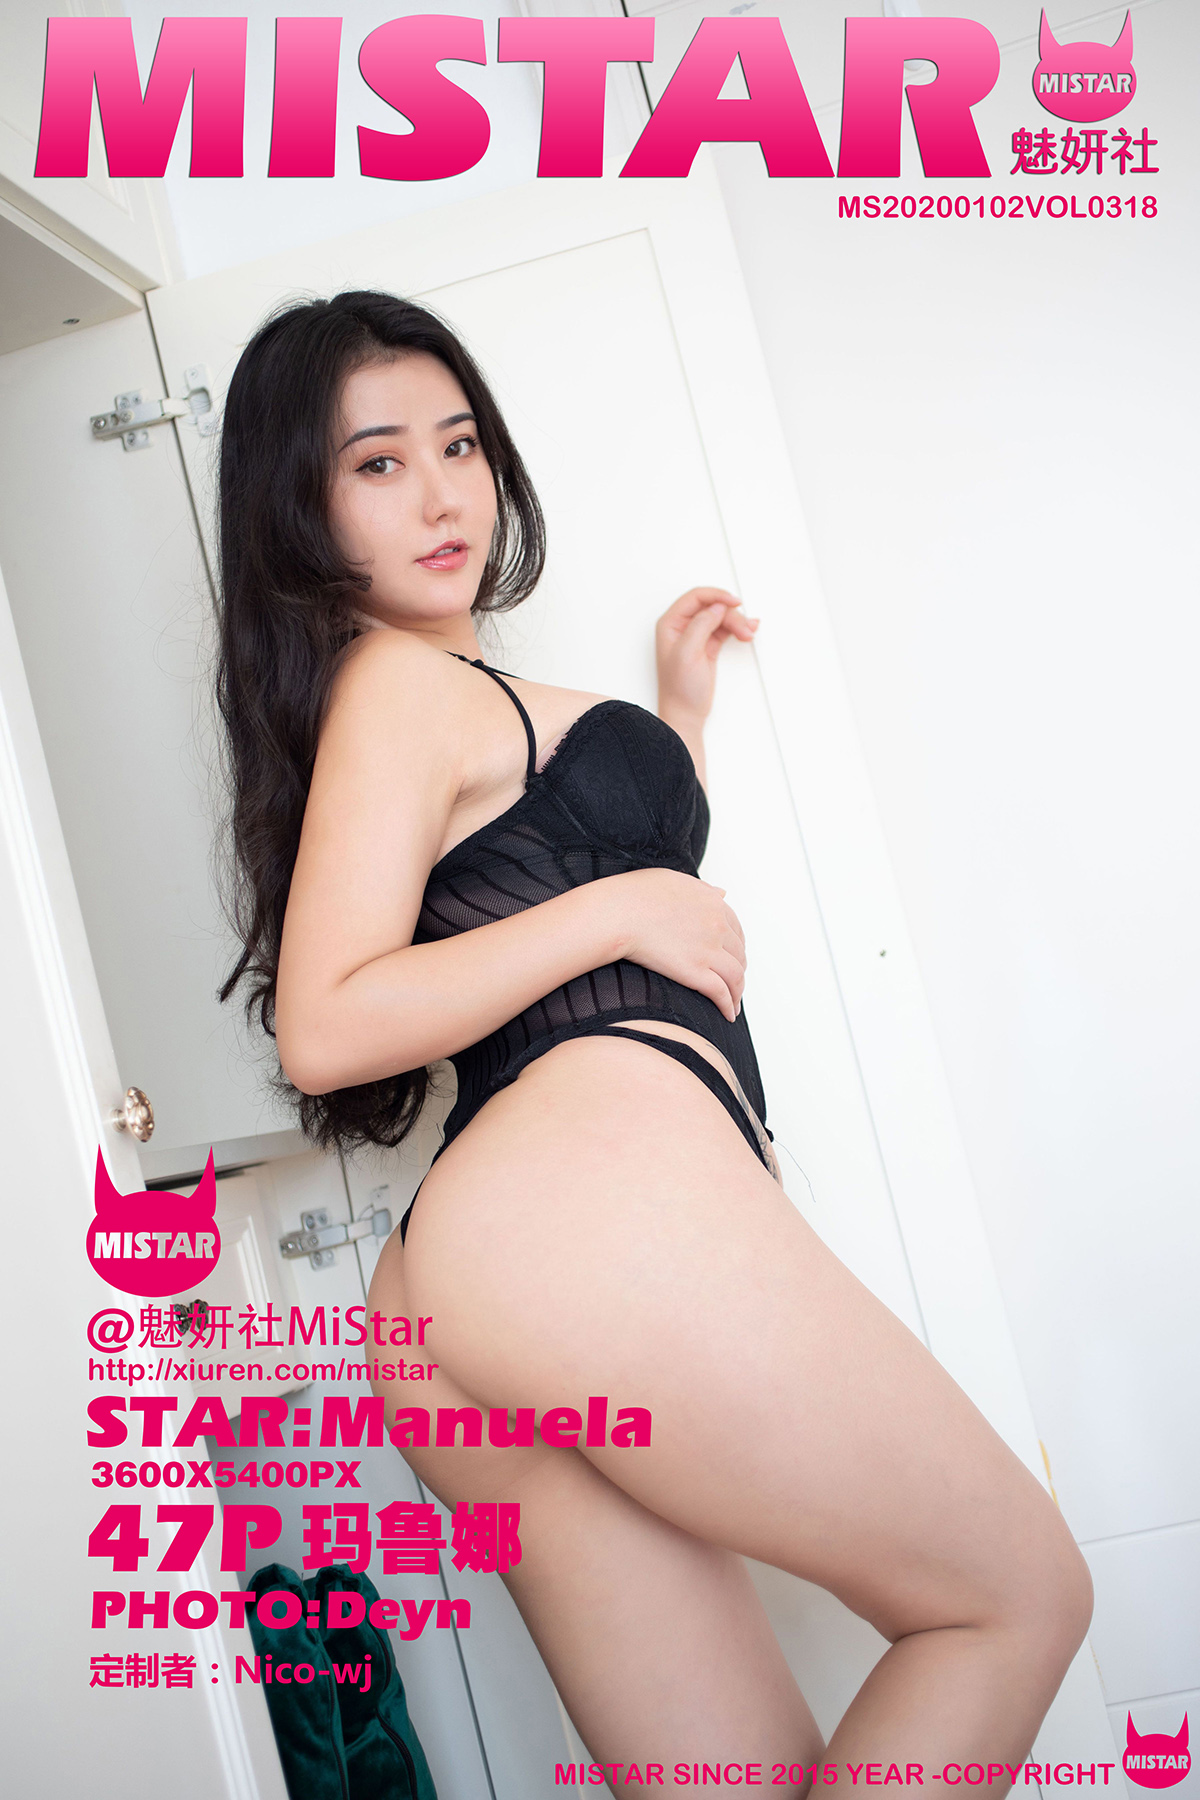 MiStar魅妍社2020.01.02VOL0318Manuela玛鲁娜